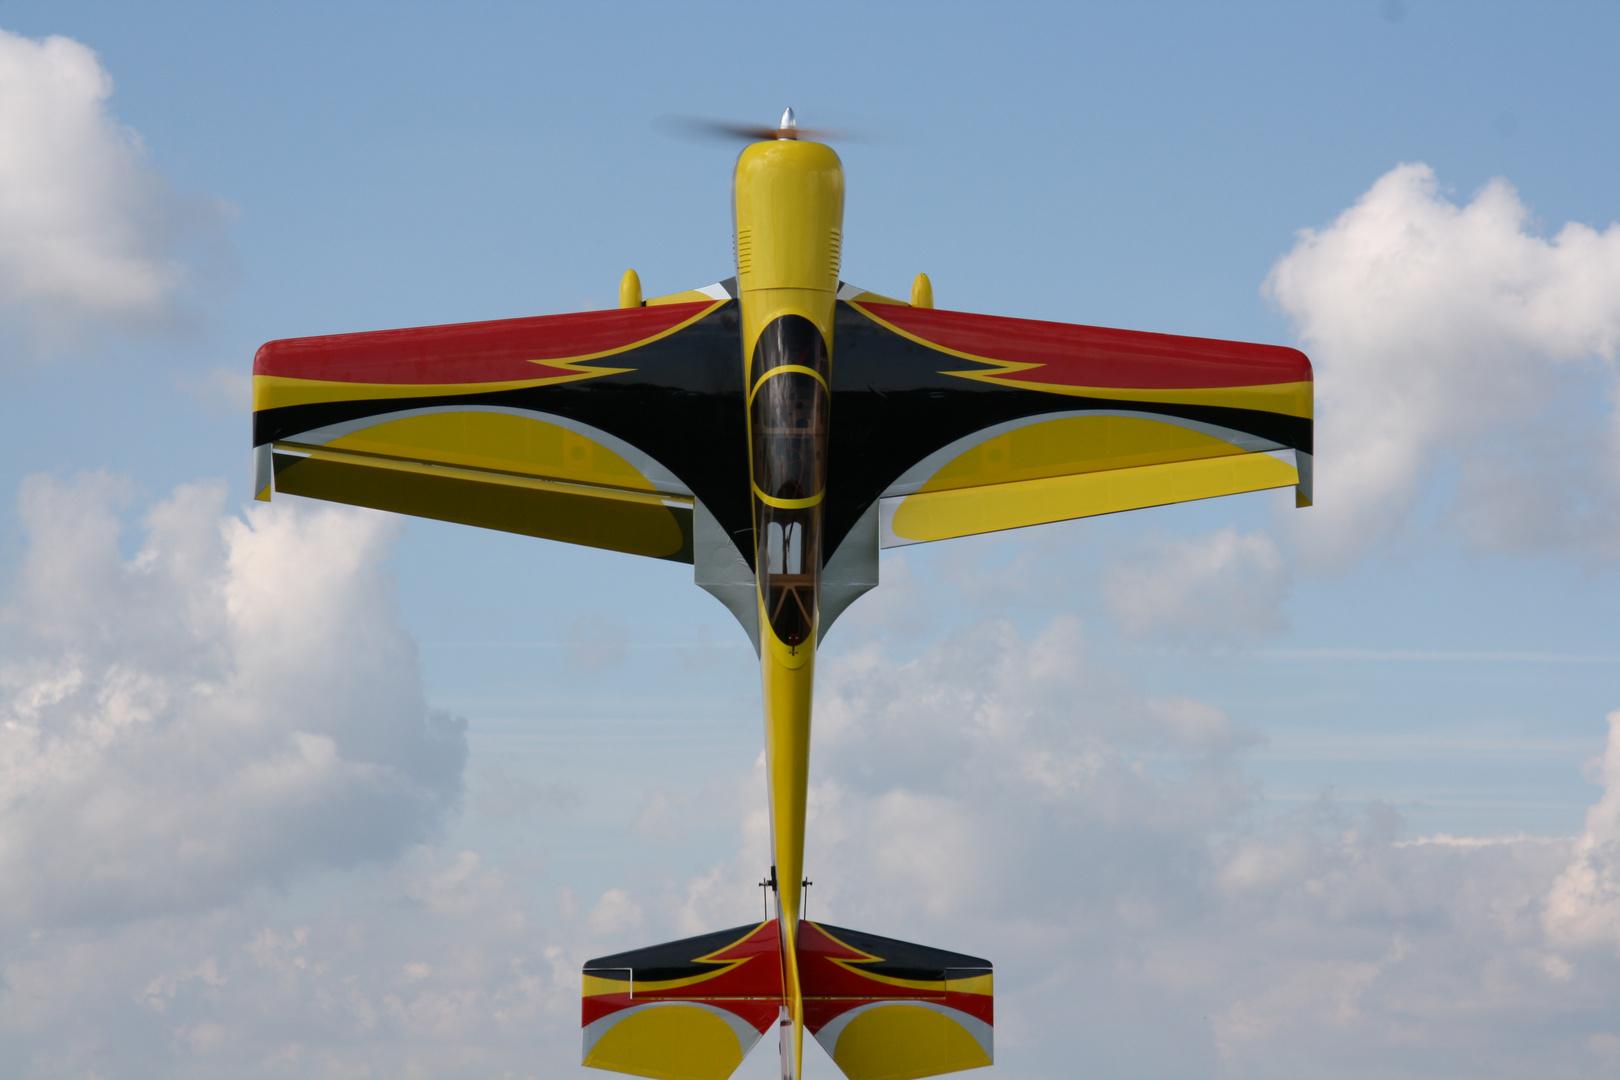 Modellflugzeug beim Kunstflug